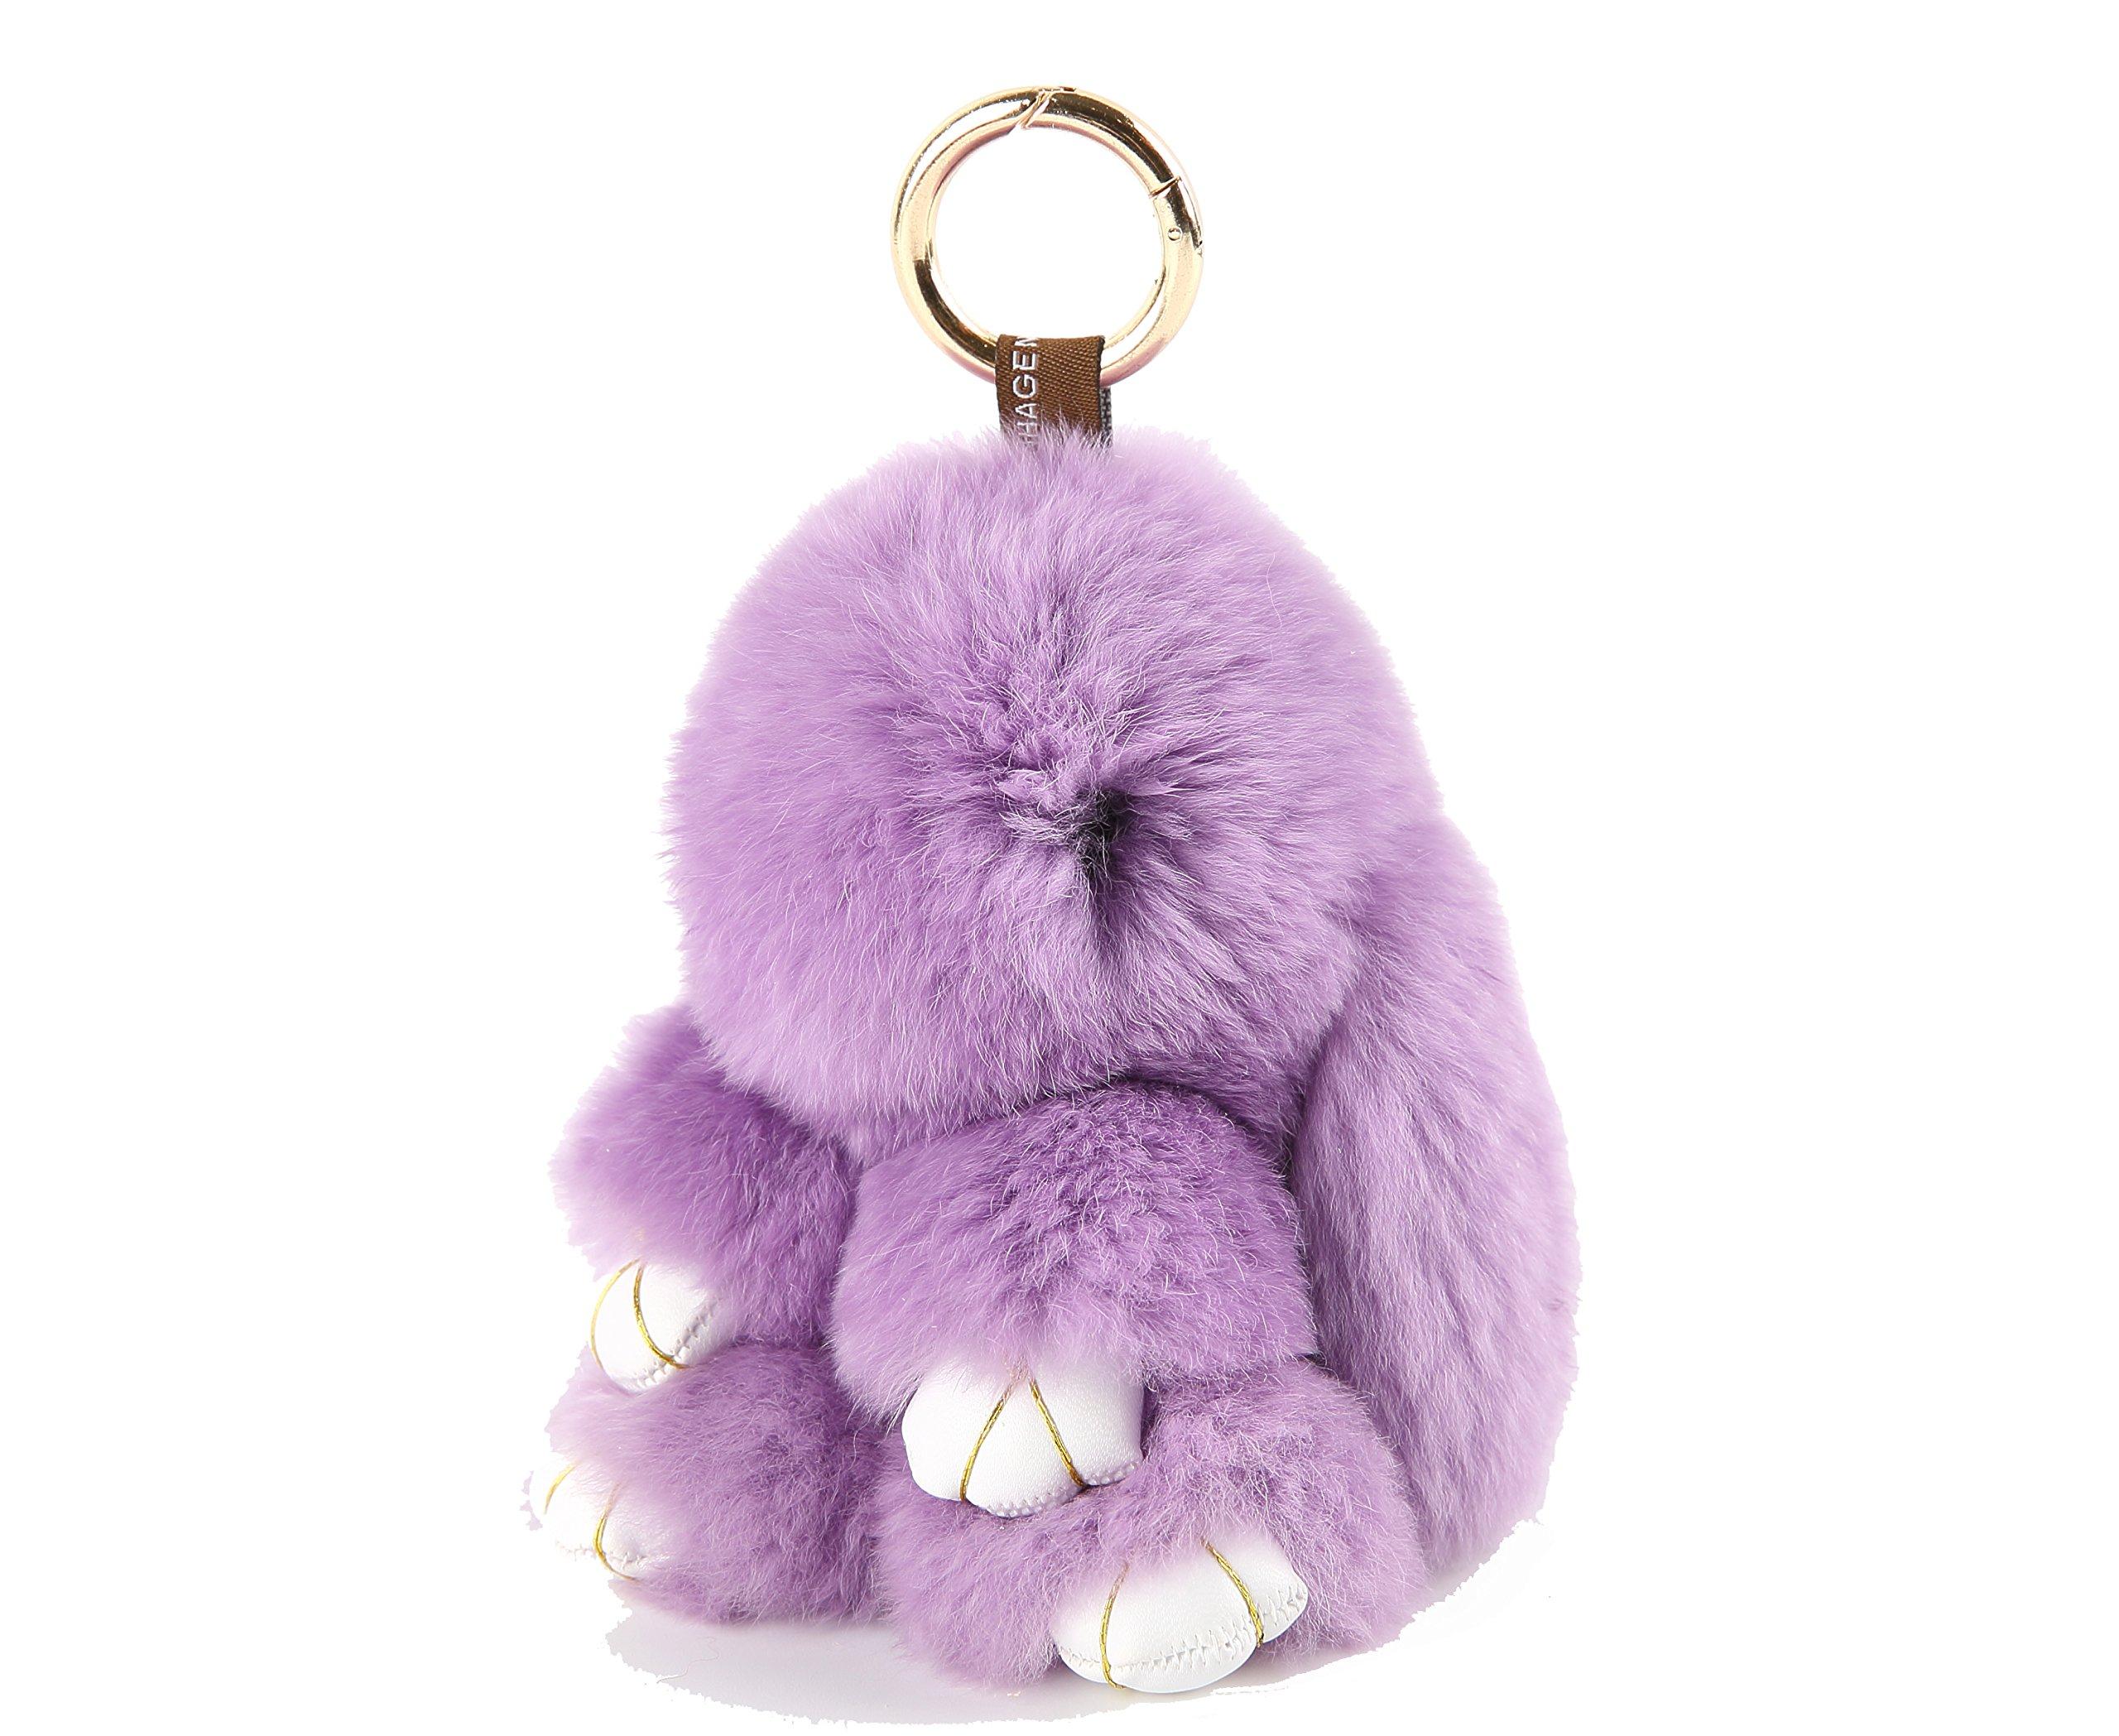 YISEVEN Stuffed Bunny Keychain Toy - Soft and Fuzzy Large Stitch Plush Rabbit Fur Key Chain - Cute Fluffy Bunnies Floppy Furry Animal Doll Gift for Girl Women Purse Bag Car Charm - Purple